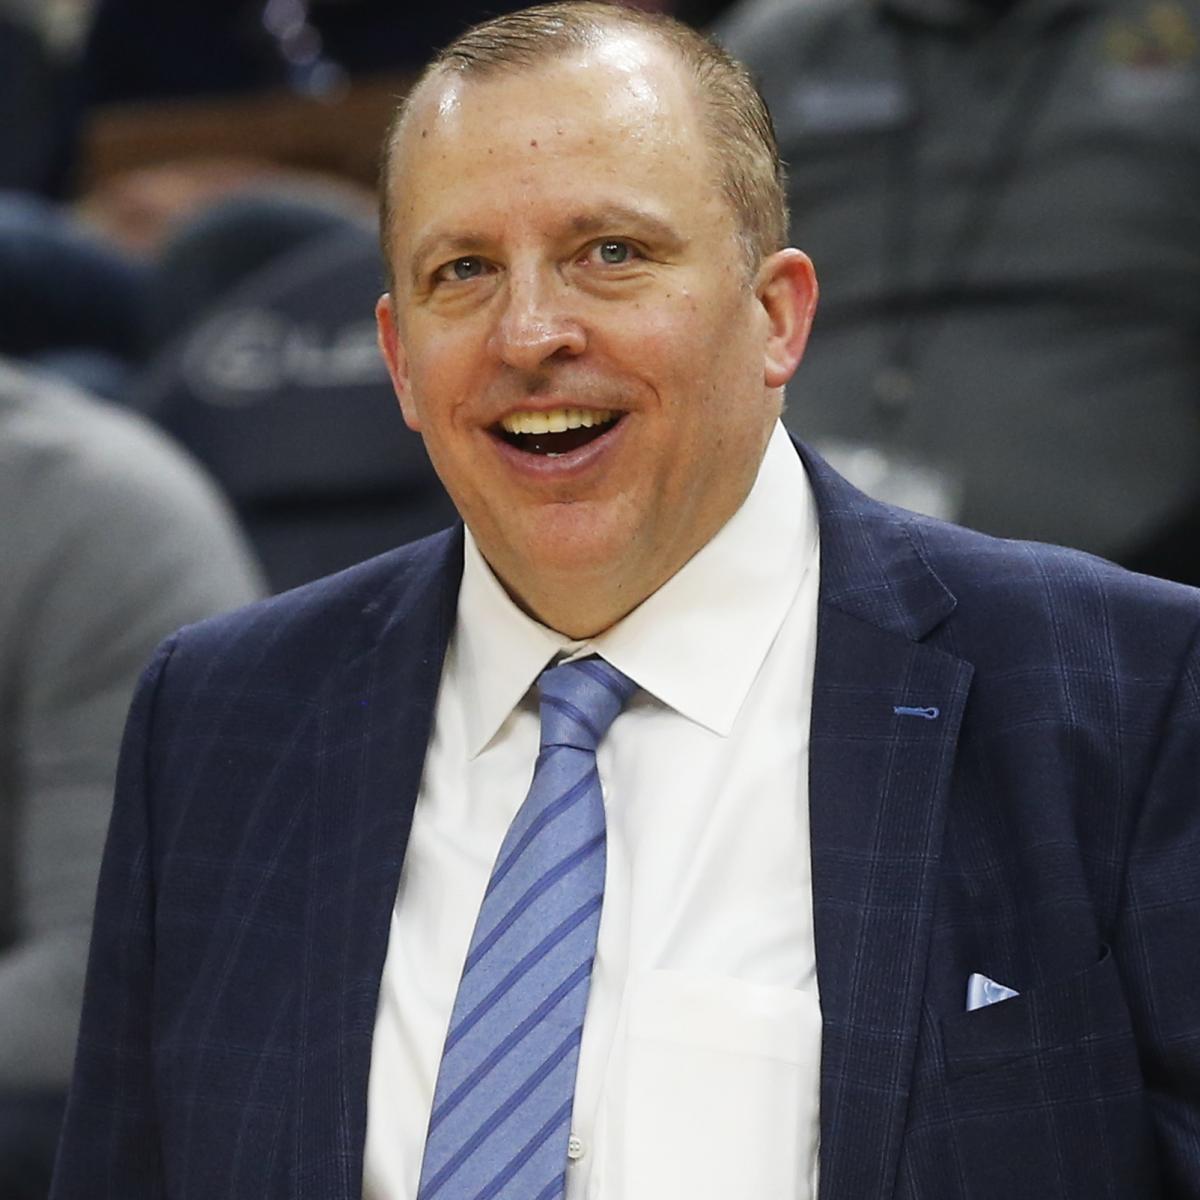 Knicks Rumors: Tom Thibodeau 'Can Taste' NY HC Job Amid Jeff Van Gundy Buzz